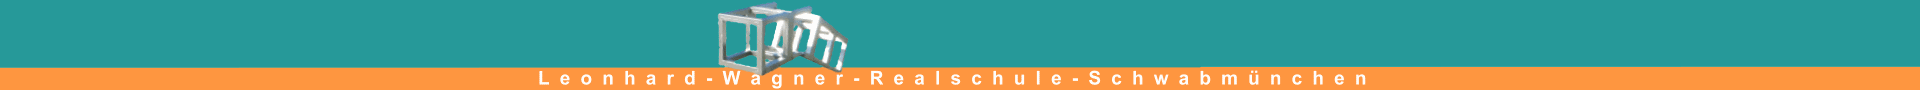 Leonhard-Wagner-Realschule Schwabmünchen